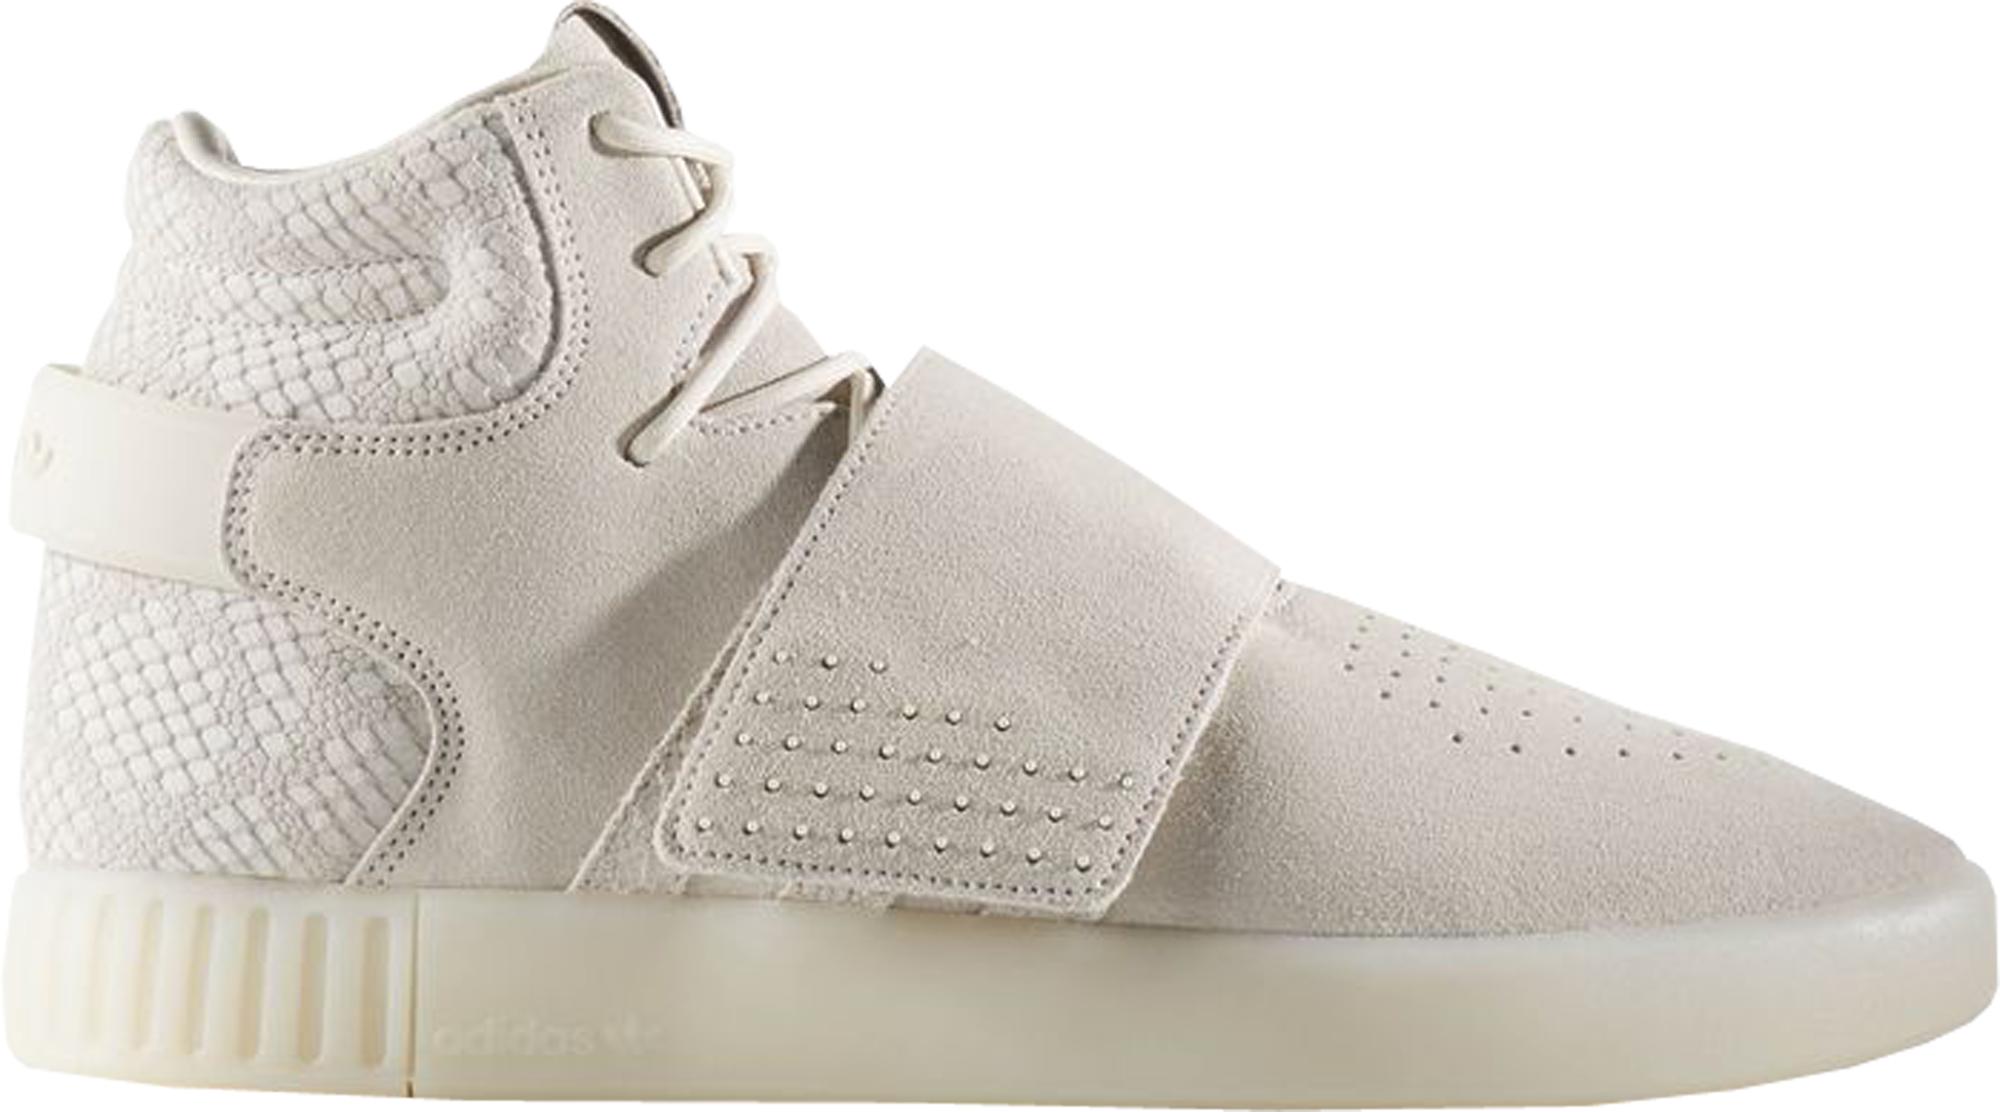 best sneakers 19b1c b0127 Tubular Invader Strap Clear Brown in Clear Brown/Clear Brown/Chalk White